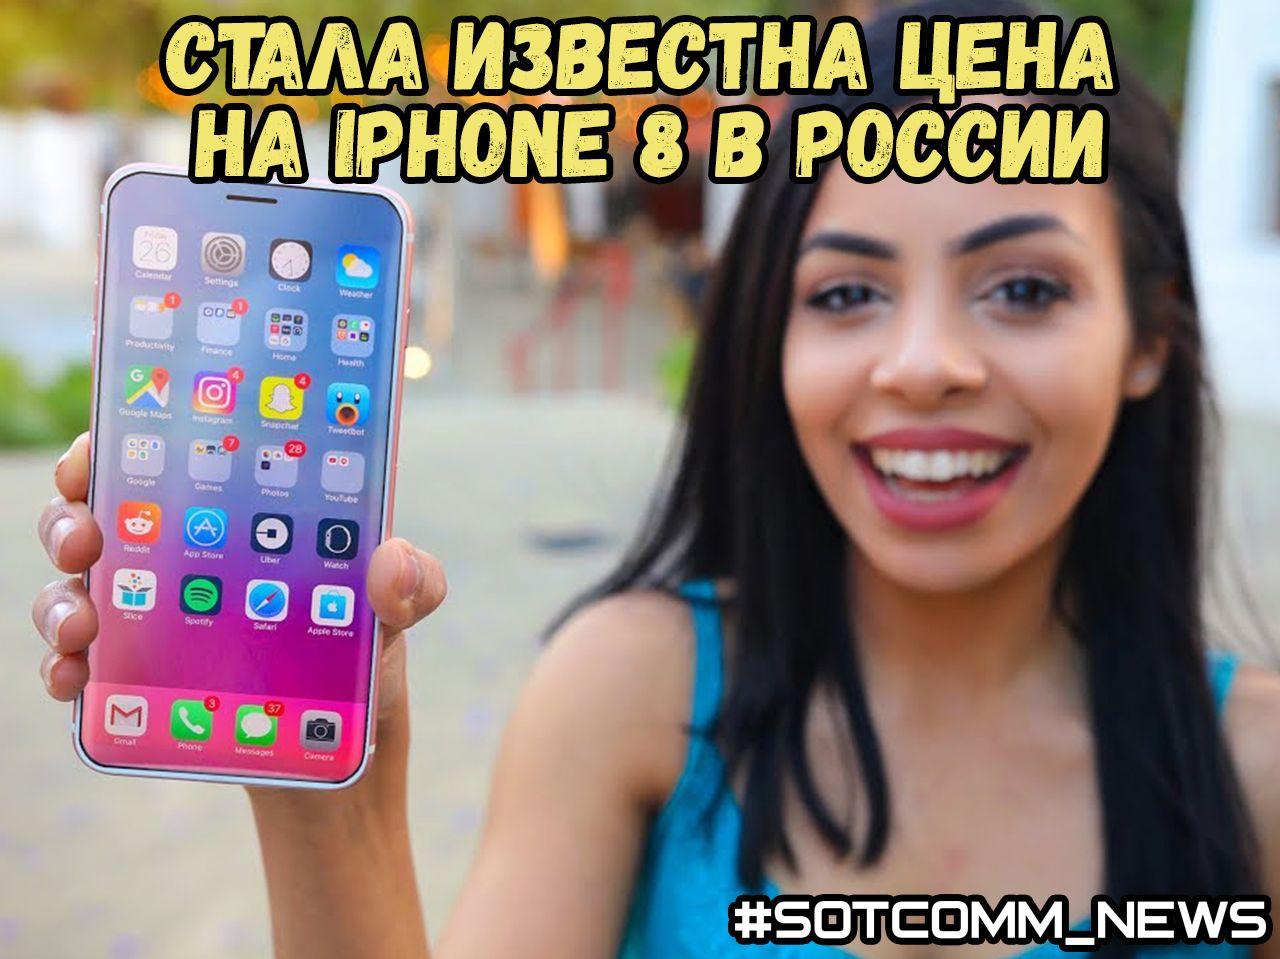 цена на iPhone 8 в России